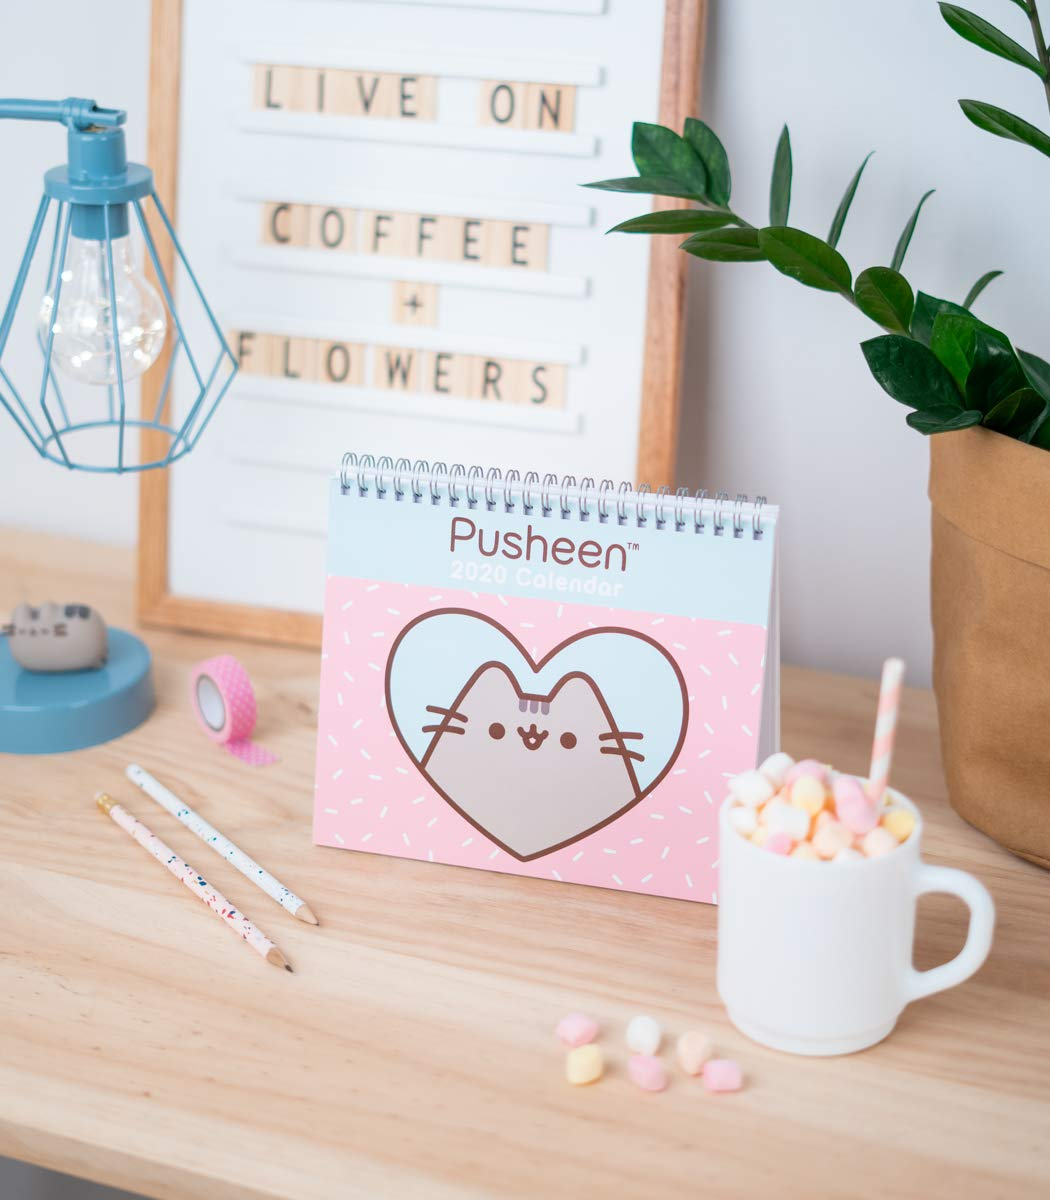 Pusheen Rose Collection Calendario annuale 2020 da scrivania 17x20 cm Erik/® ideale per casa o ufficio